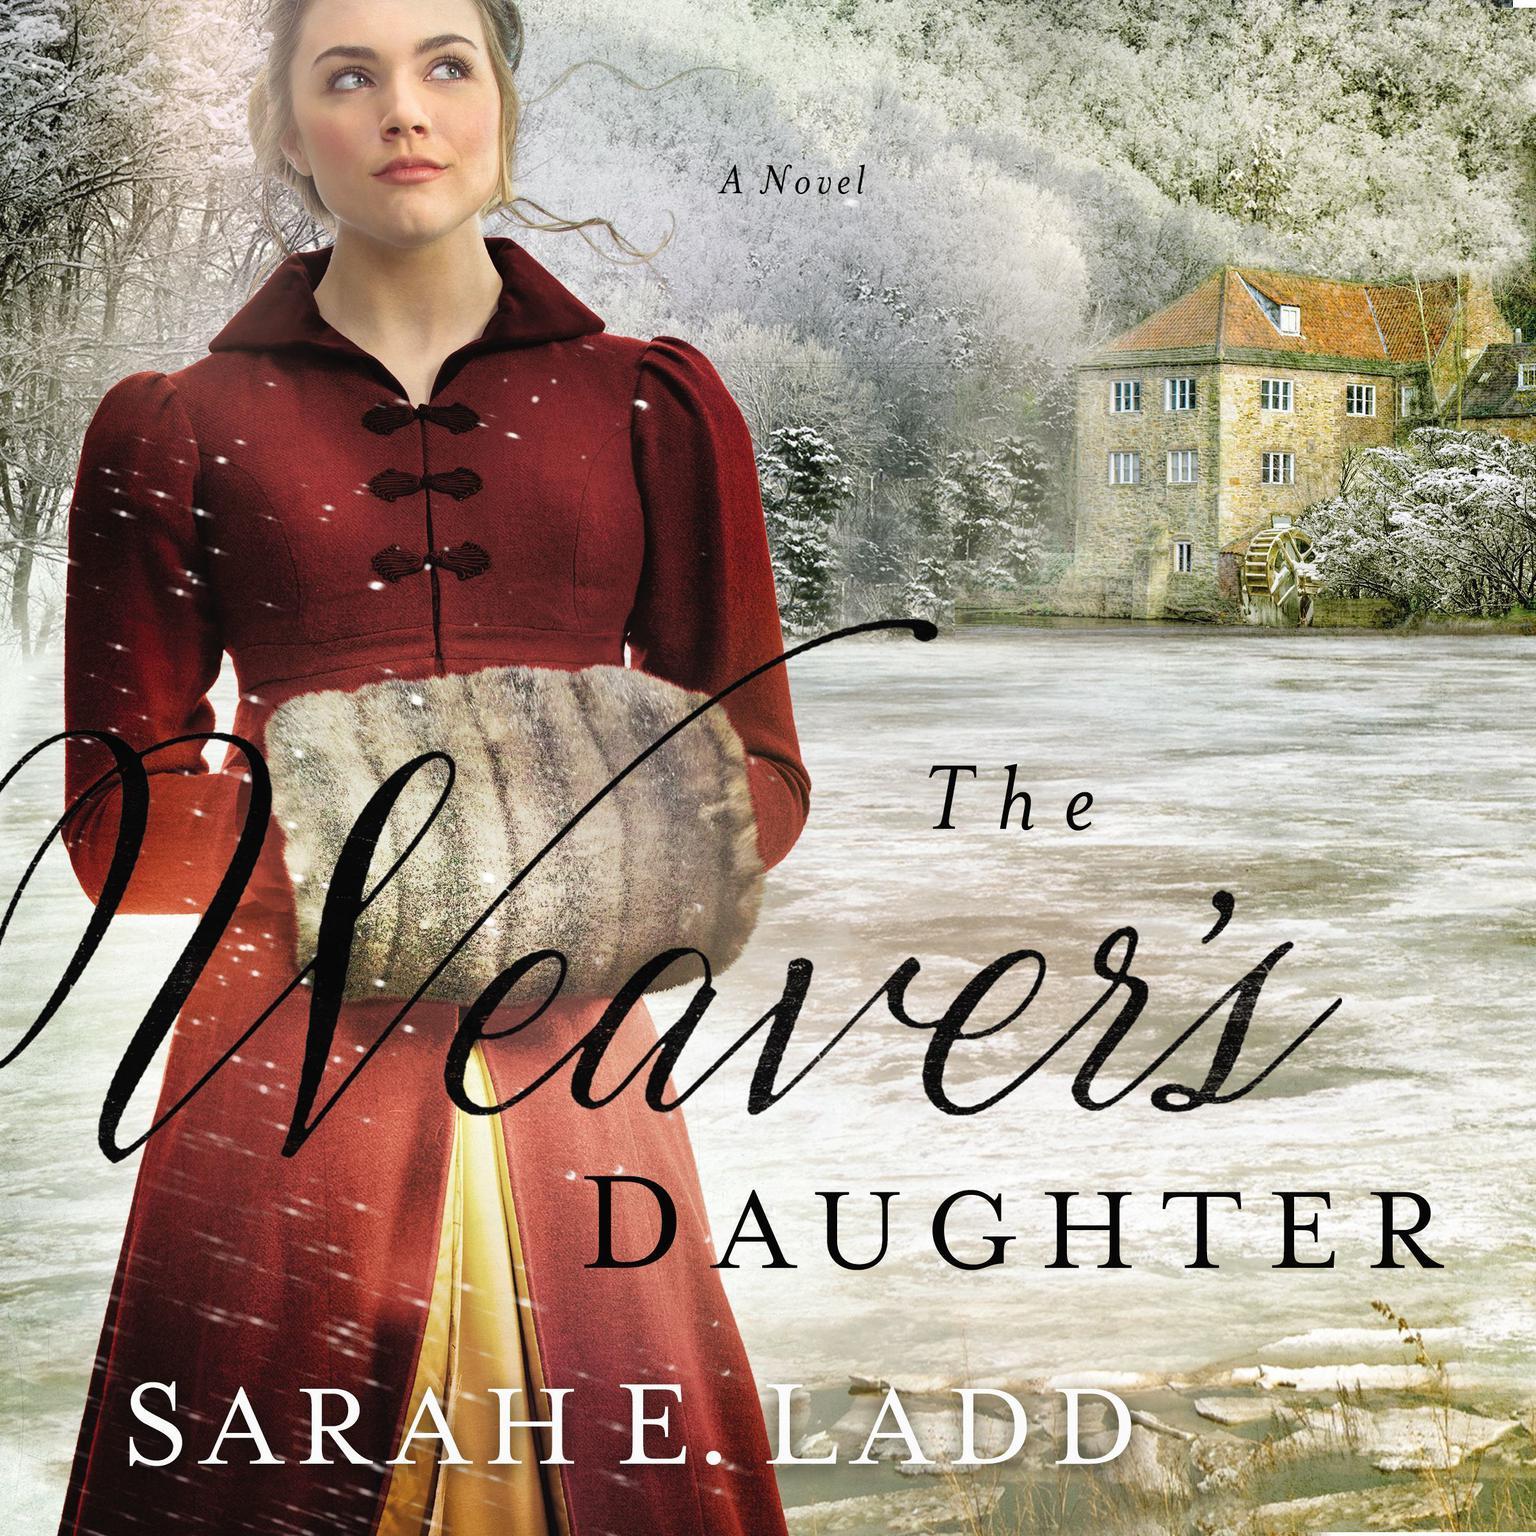 The Weavers Daughter: A Regency Romance Novel Audiobook, by Sarah E. Ladd